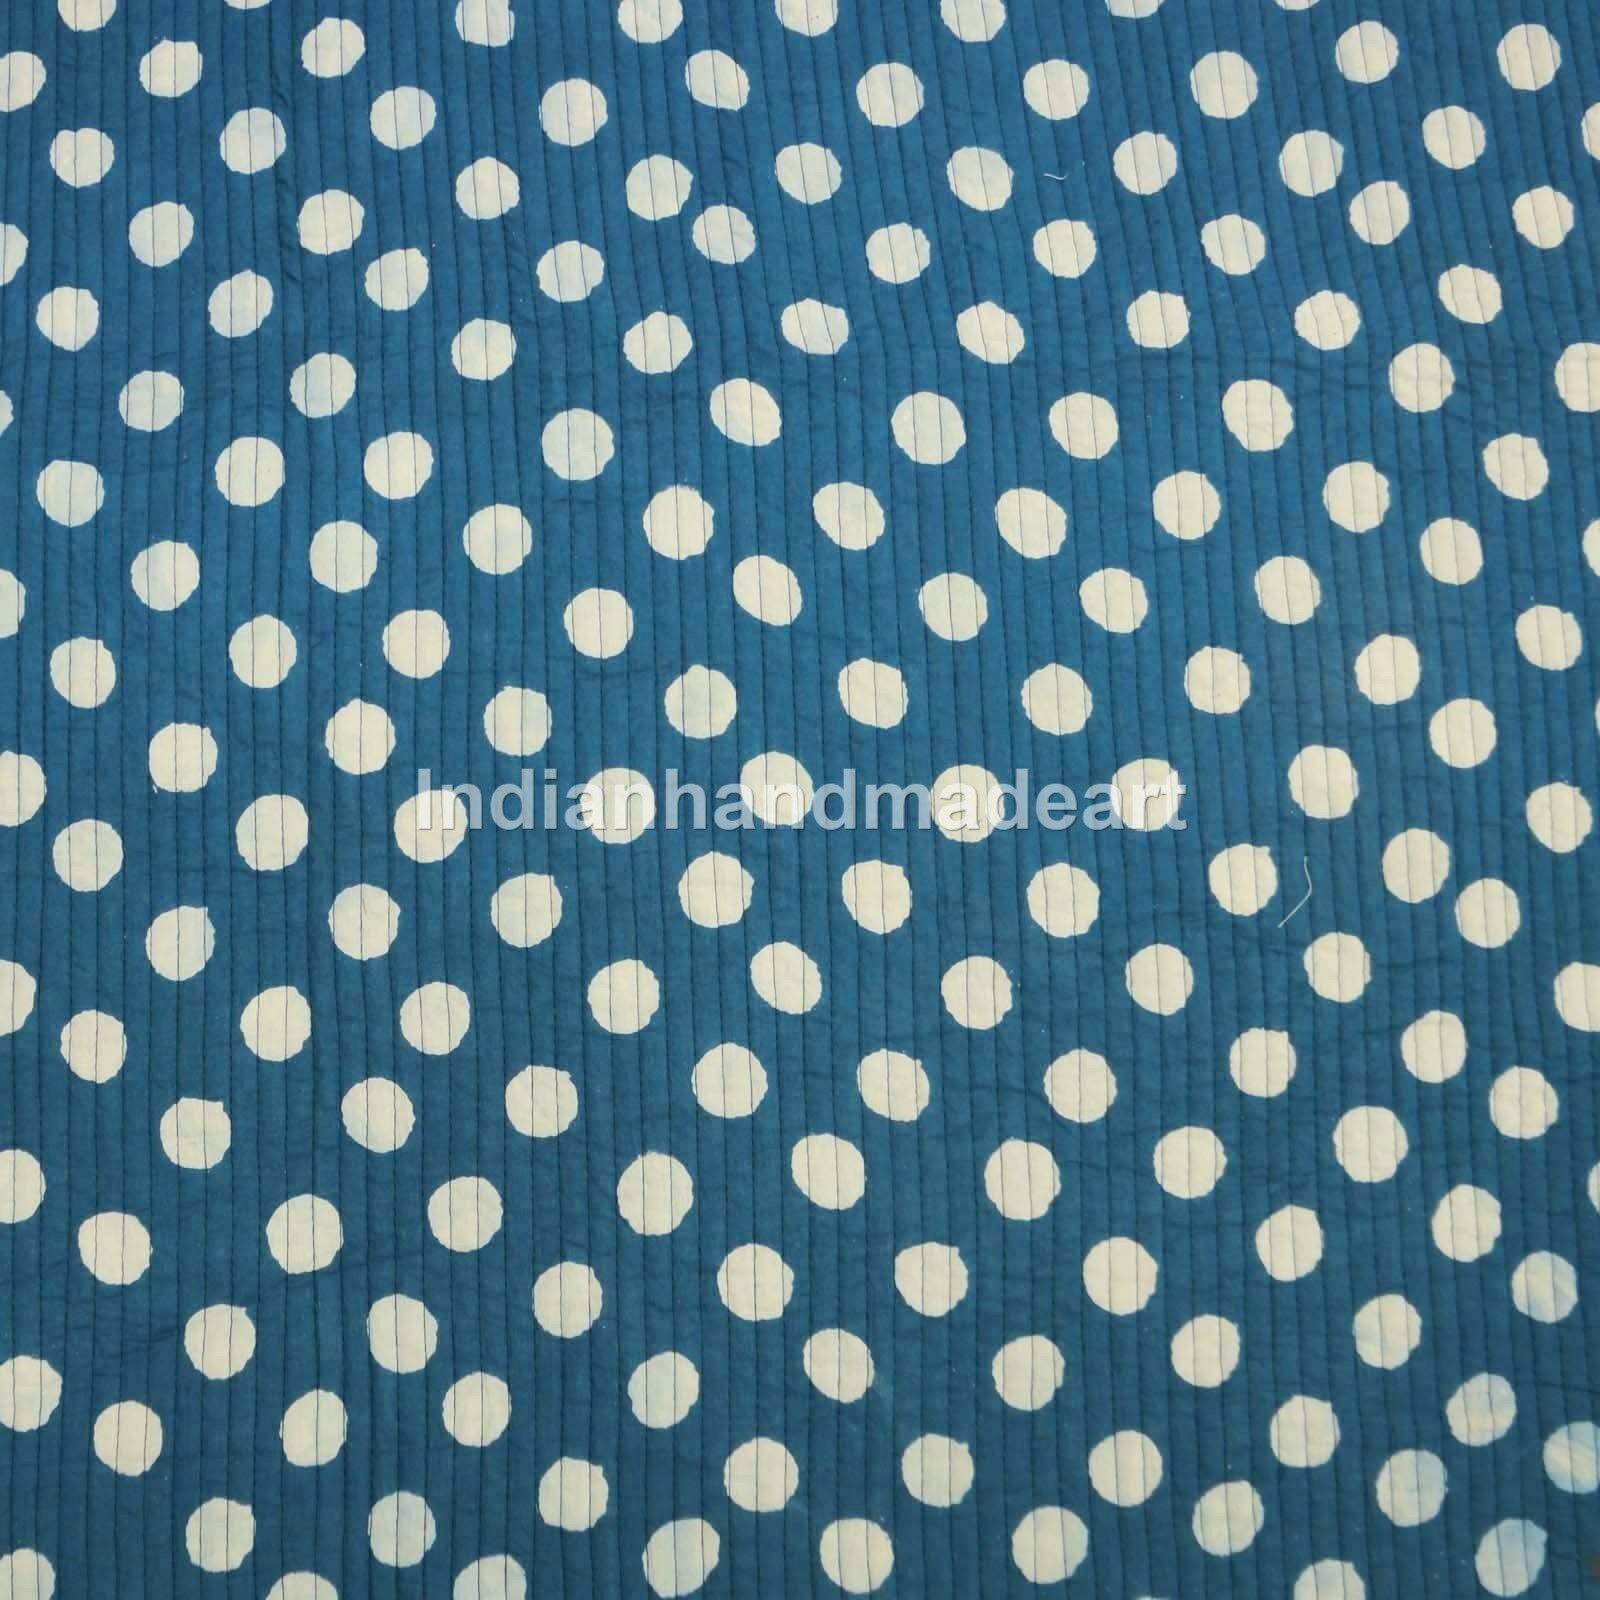 Kantha Quilt Pure 100% Cotton Hand stitched Queen Size Indigo bluee Indian Quilt